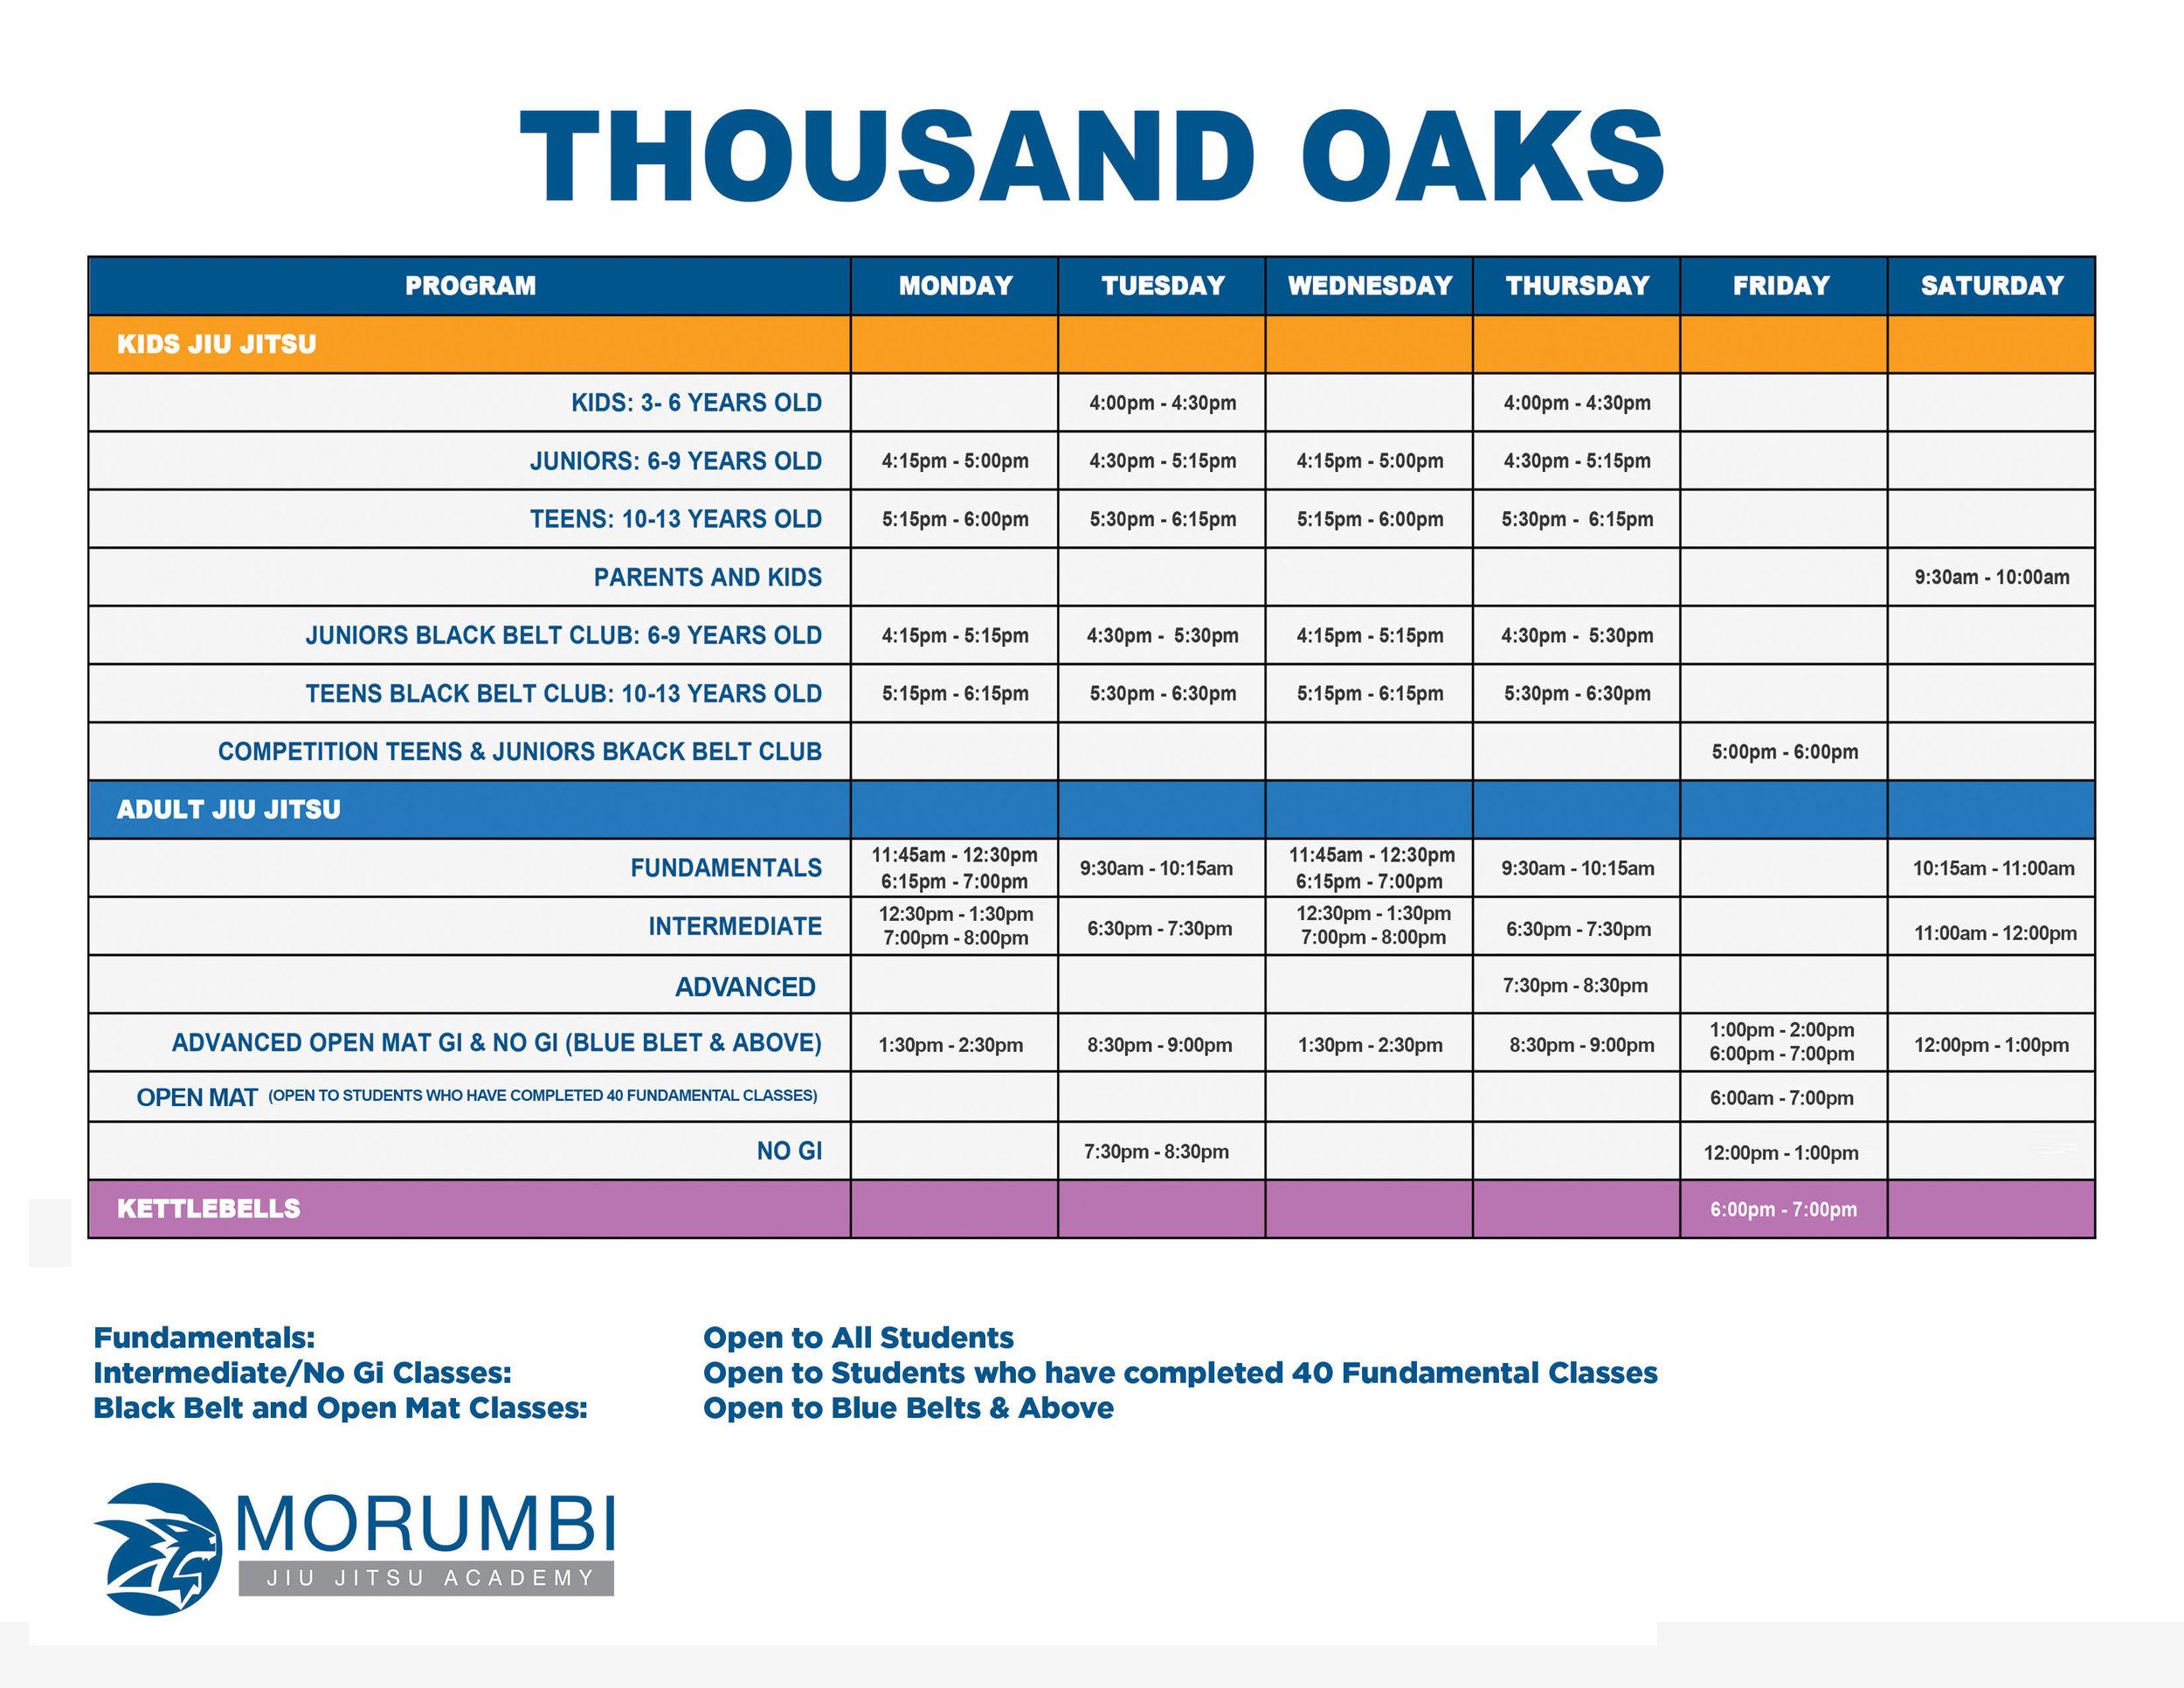 Morumbi-Jiu-Jitsu-Fitness-Academy-Thousand-Oaks_Schedule-12-2018.jpg